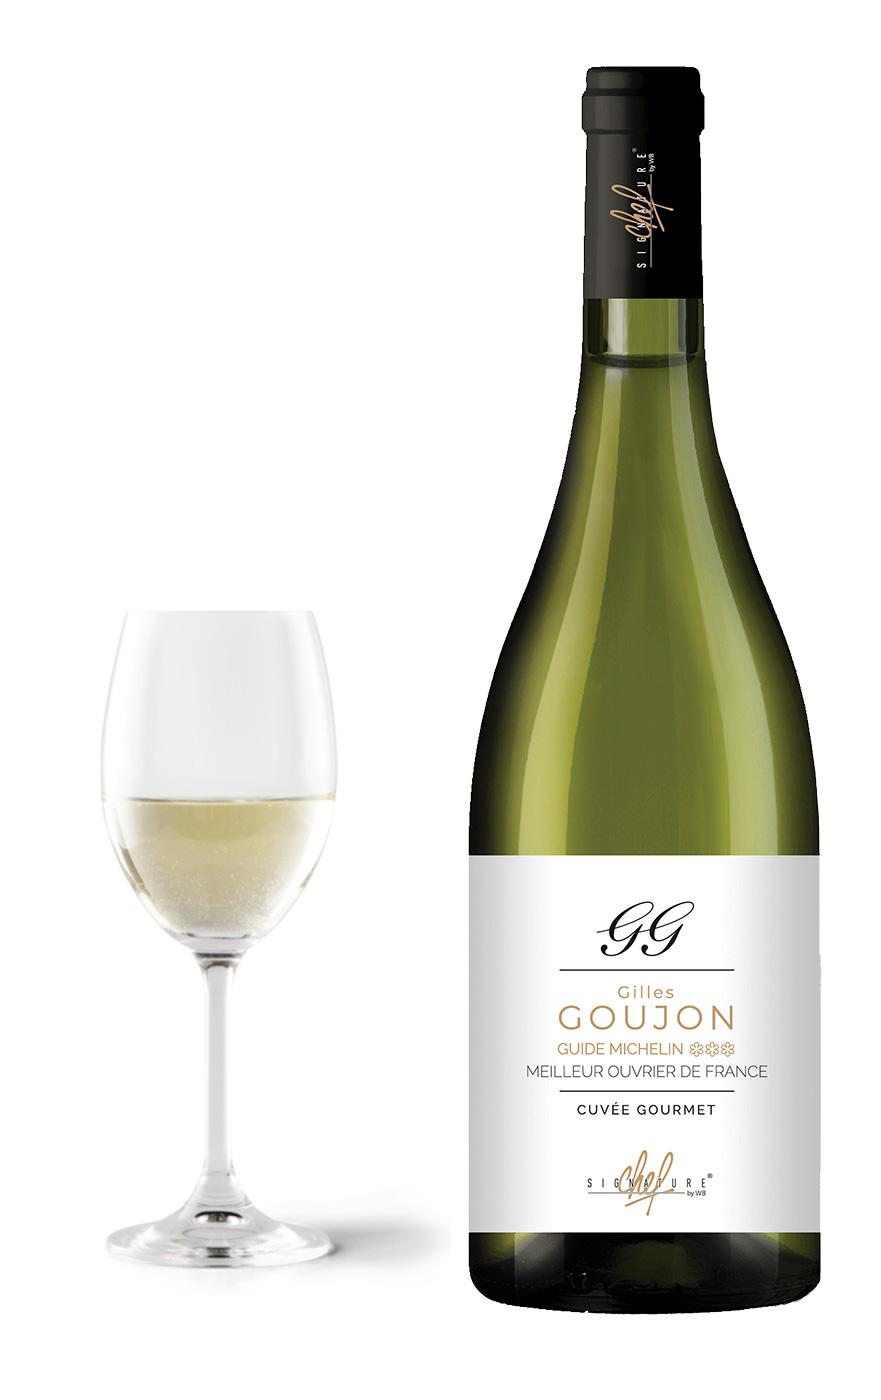 Gilles Goujon - Vin blanc Chardonnay - Signature Chef